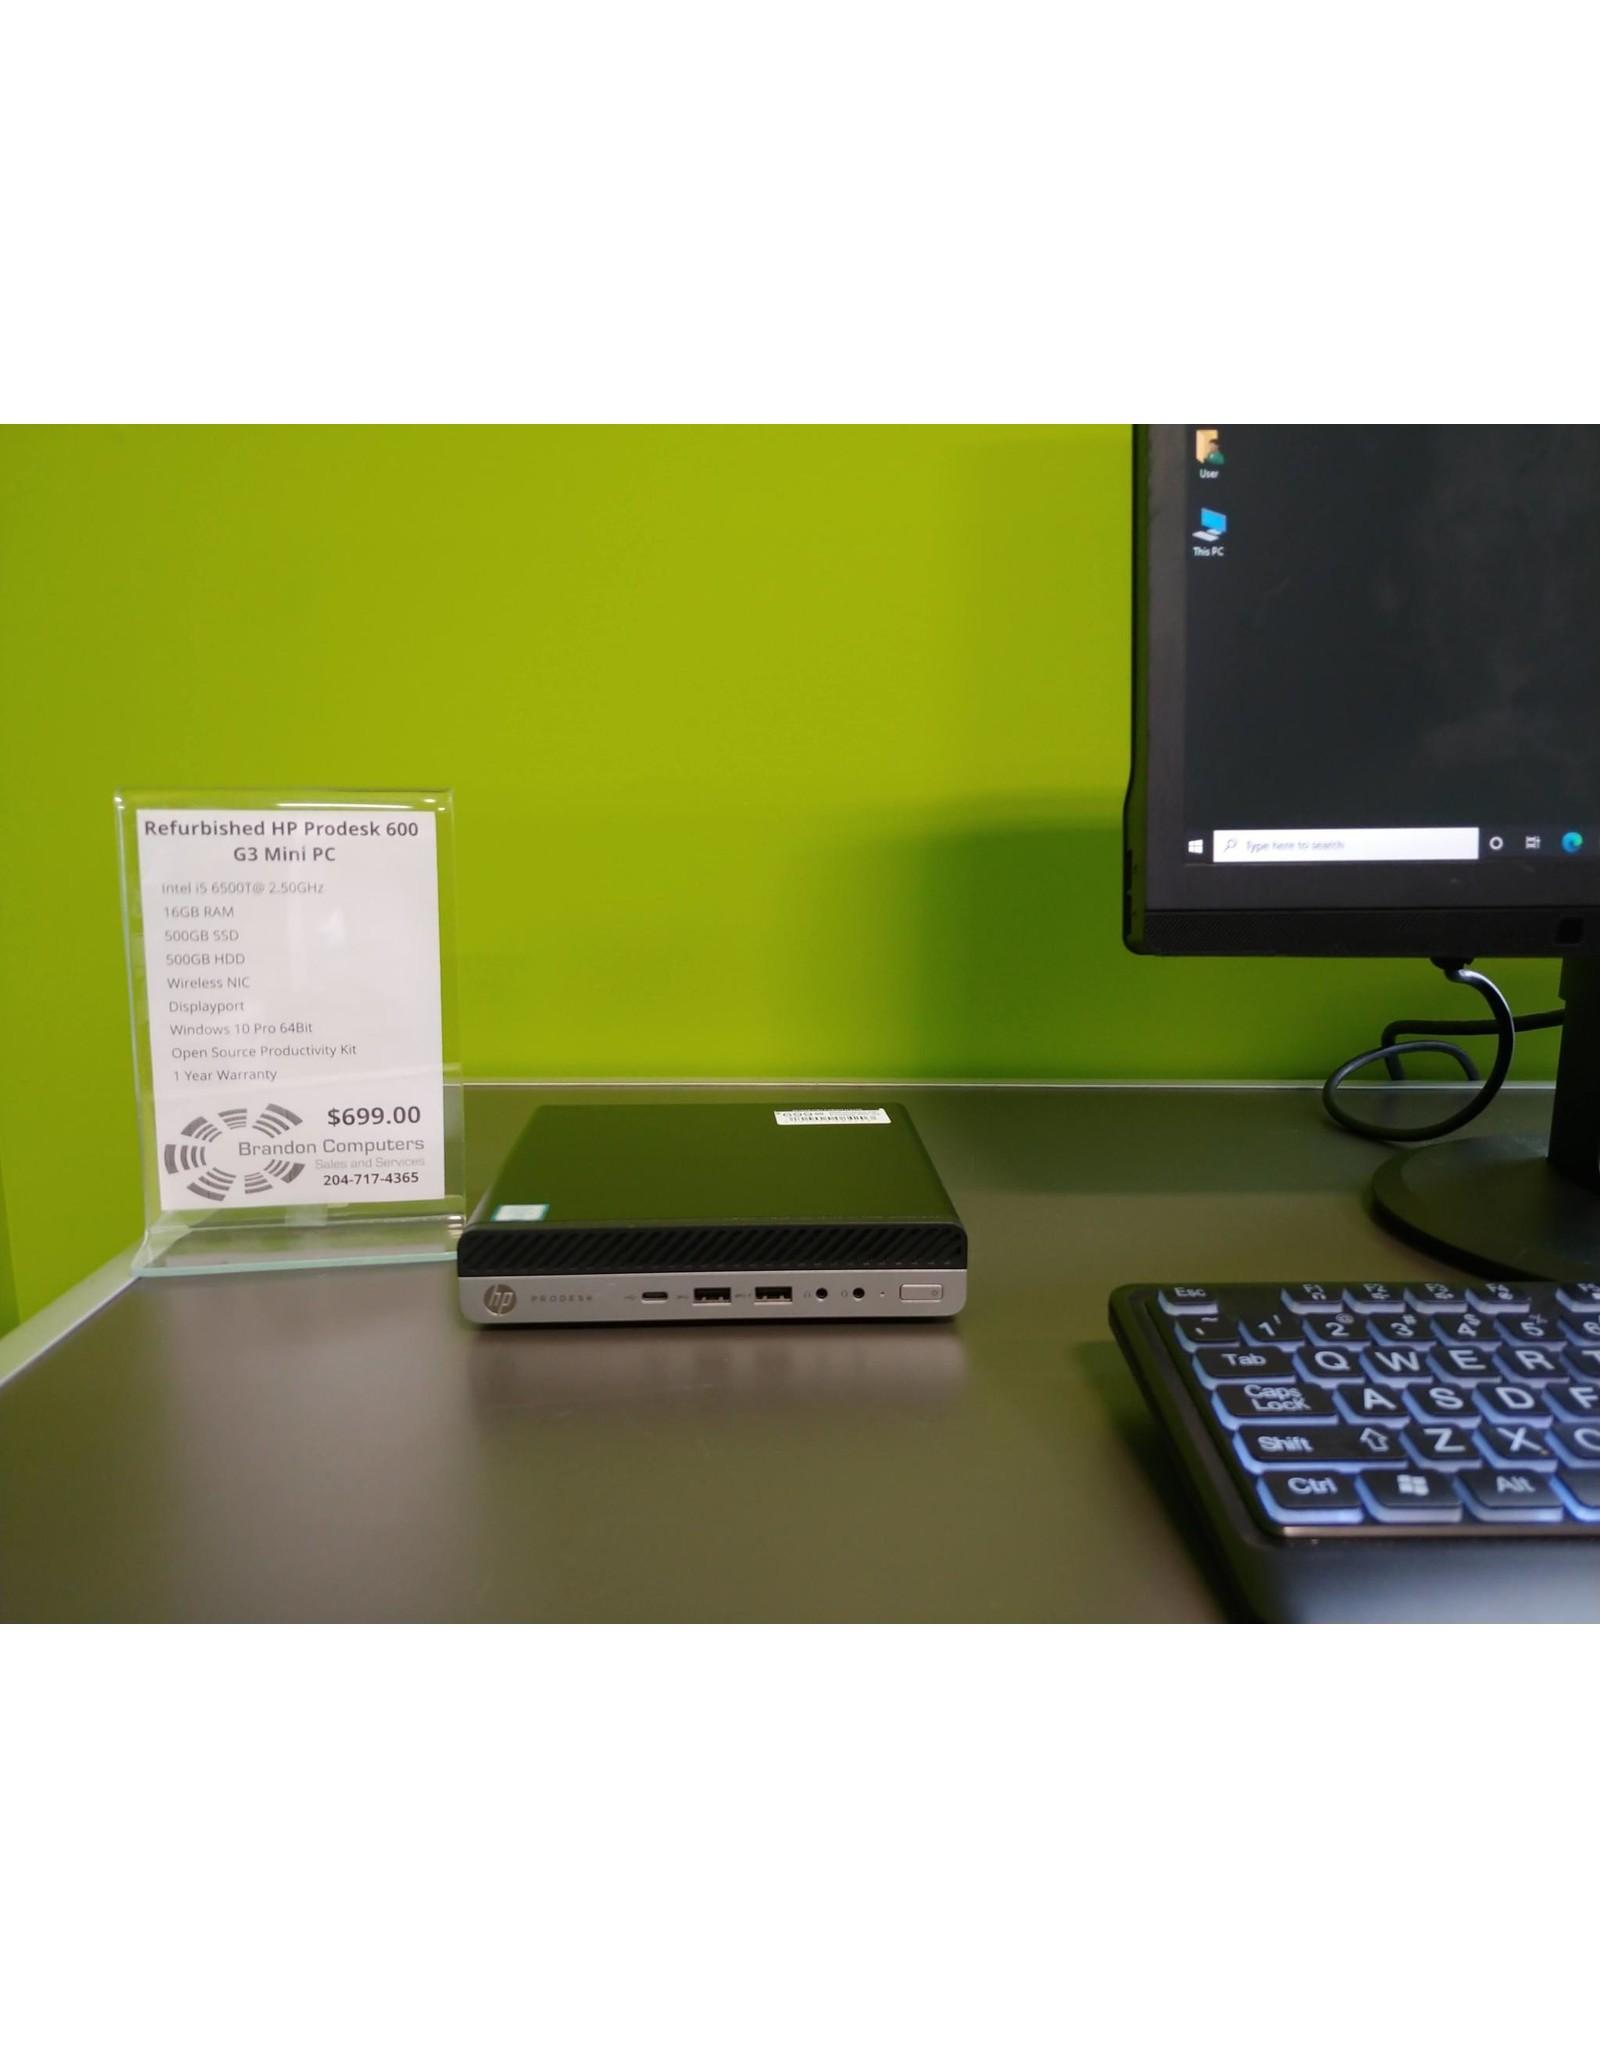 HP Refurbished HP Prodesk 600 G3 Mini PC